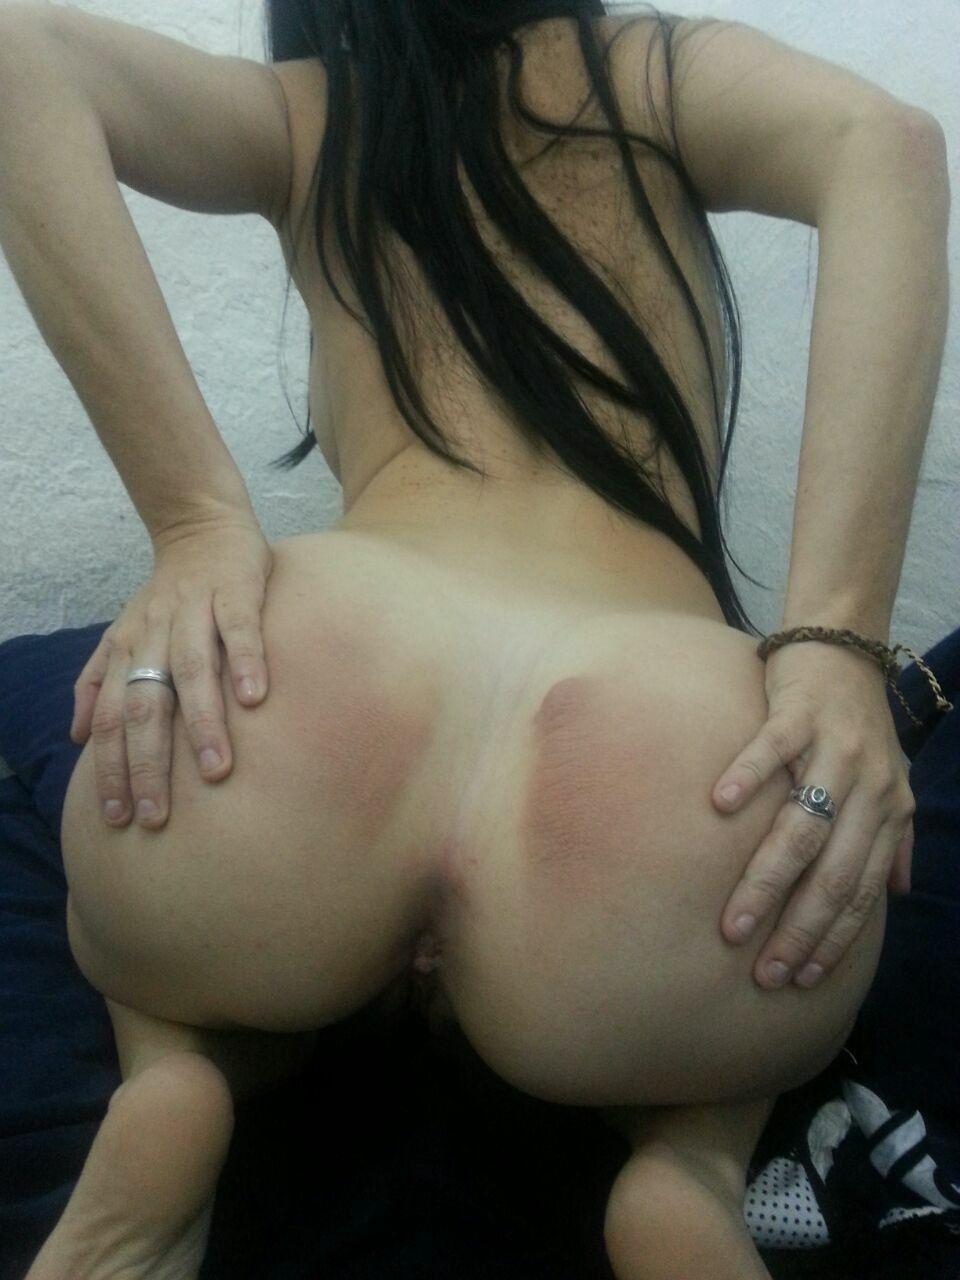 Fotos chicas de Badoo desnudas y buscando sexo gratis